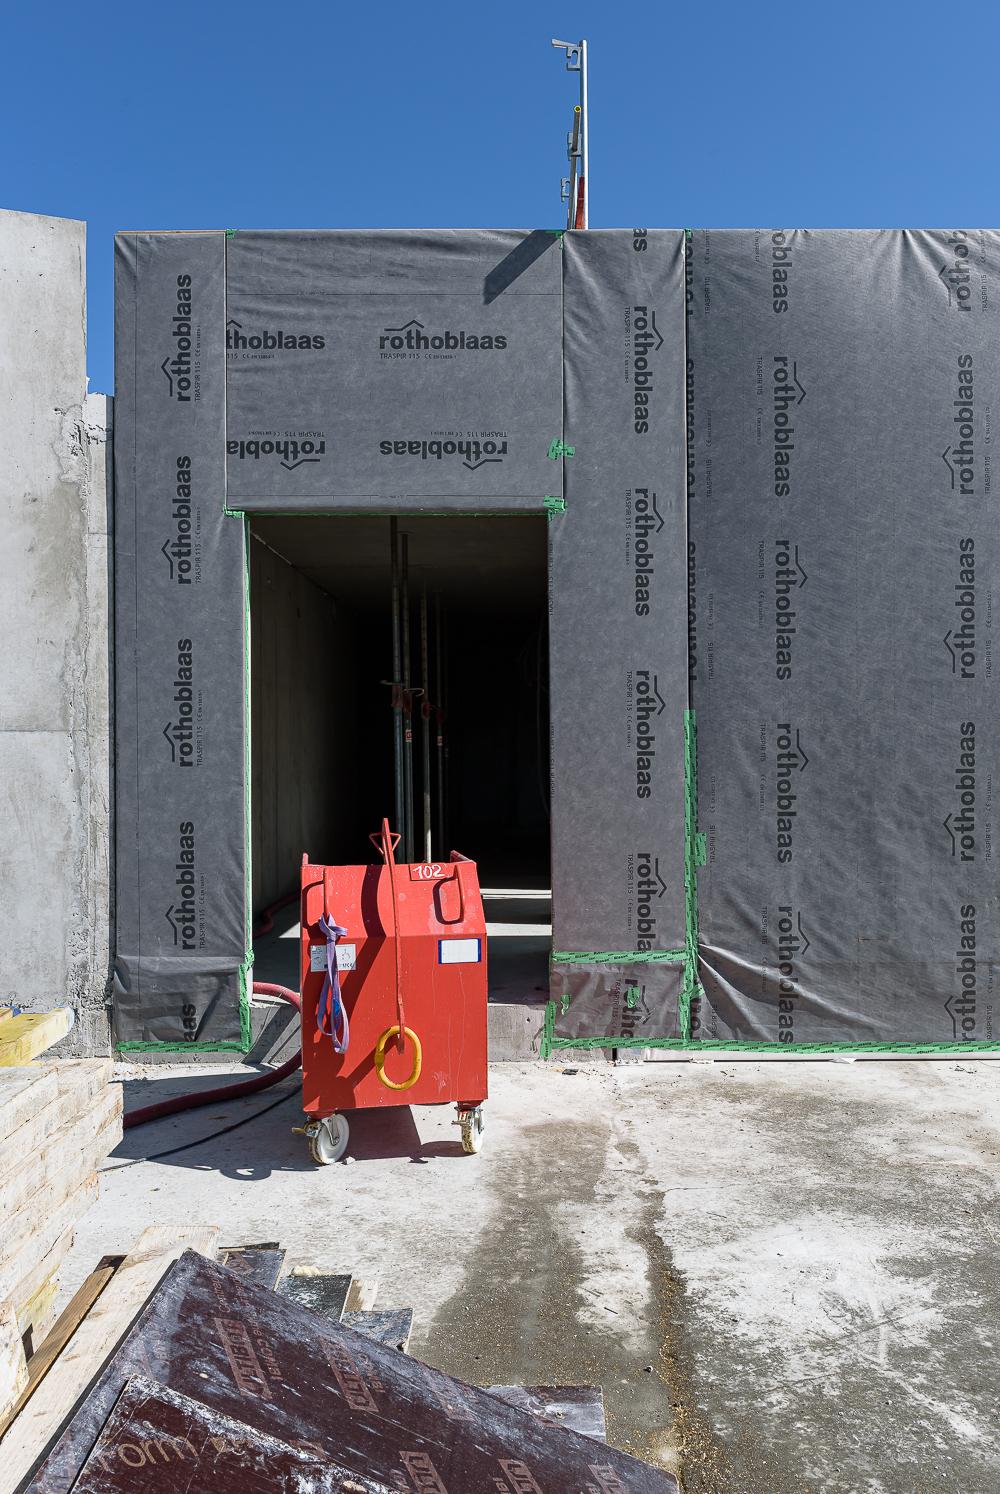 PAYSdeLOIRE-AIA-chantier-NsE-08